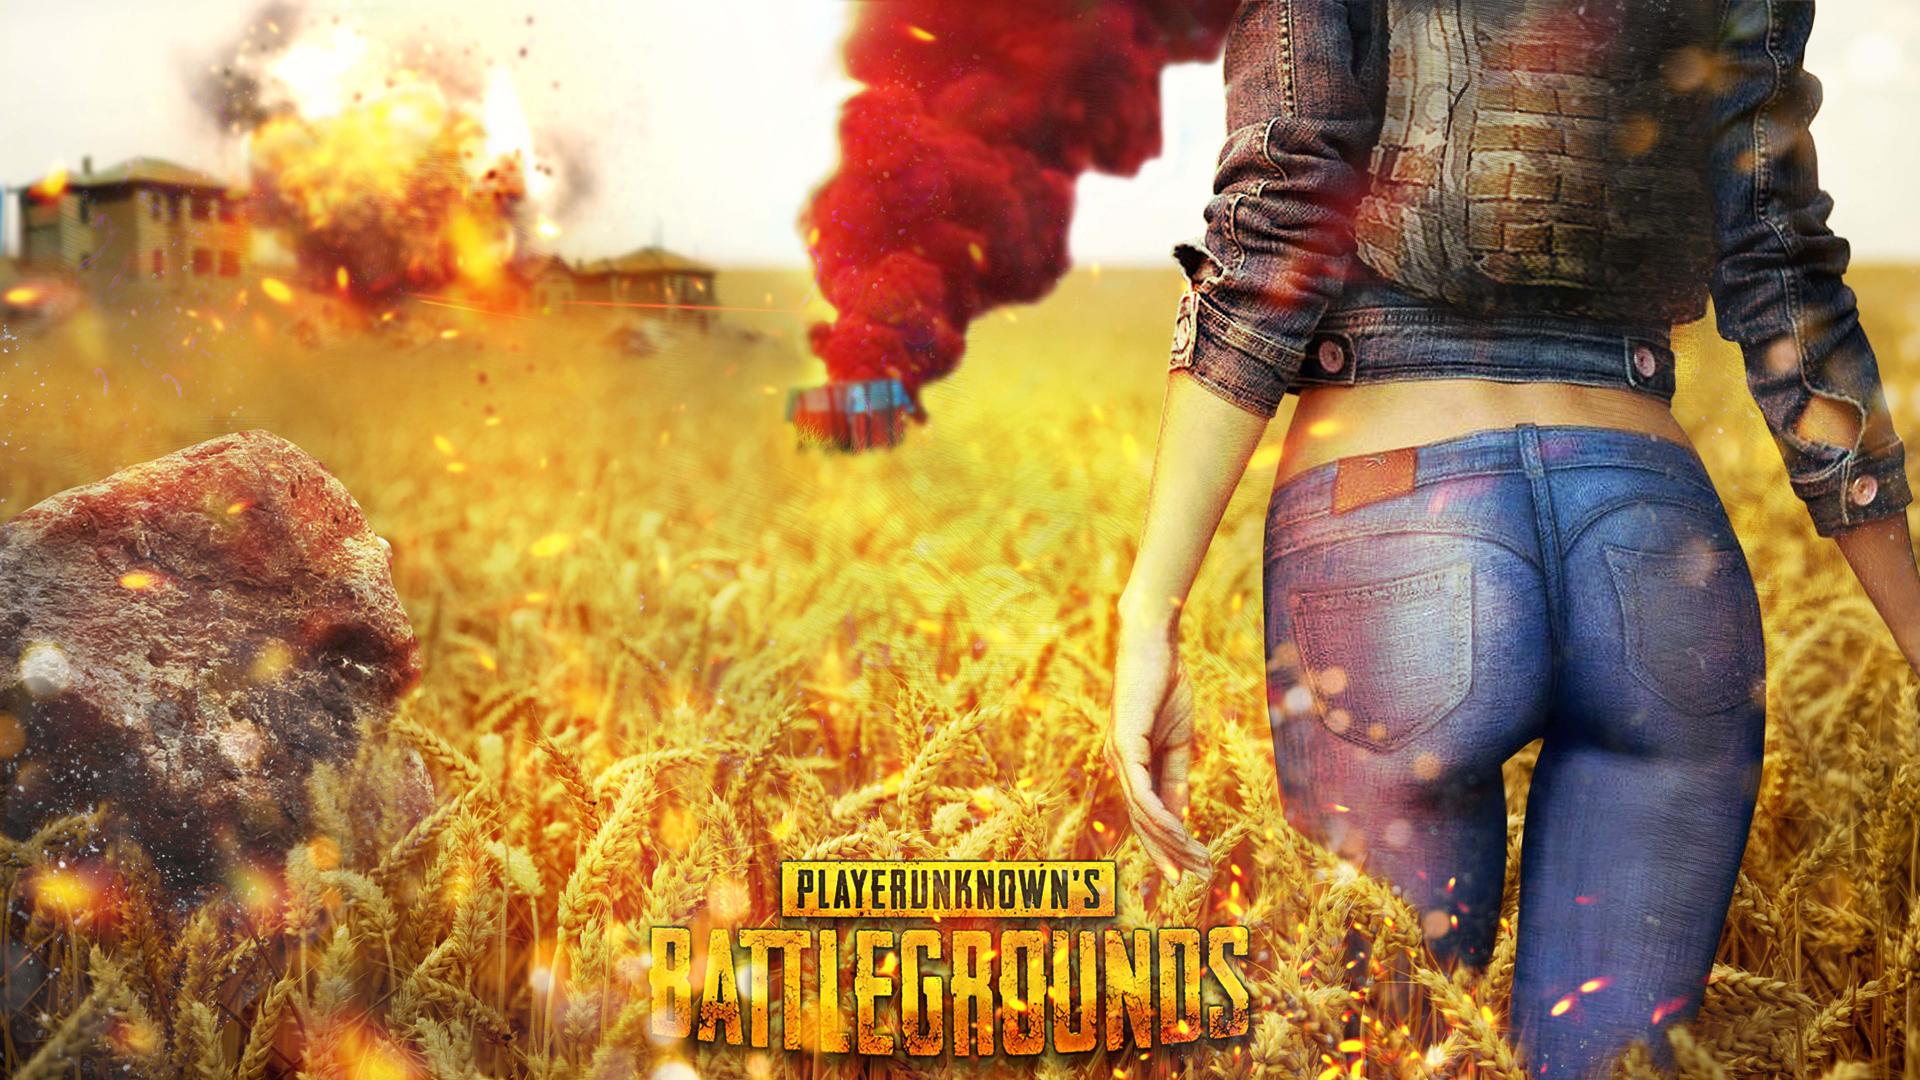 Playerunknowns Battlegrounds Game Hd Games 4k Wallpapers: 1920x1080 Playerunknowns Battlegrounds 1080P Laptop Full